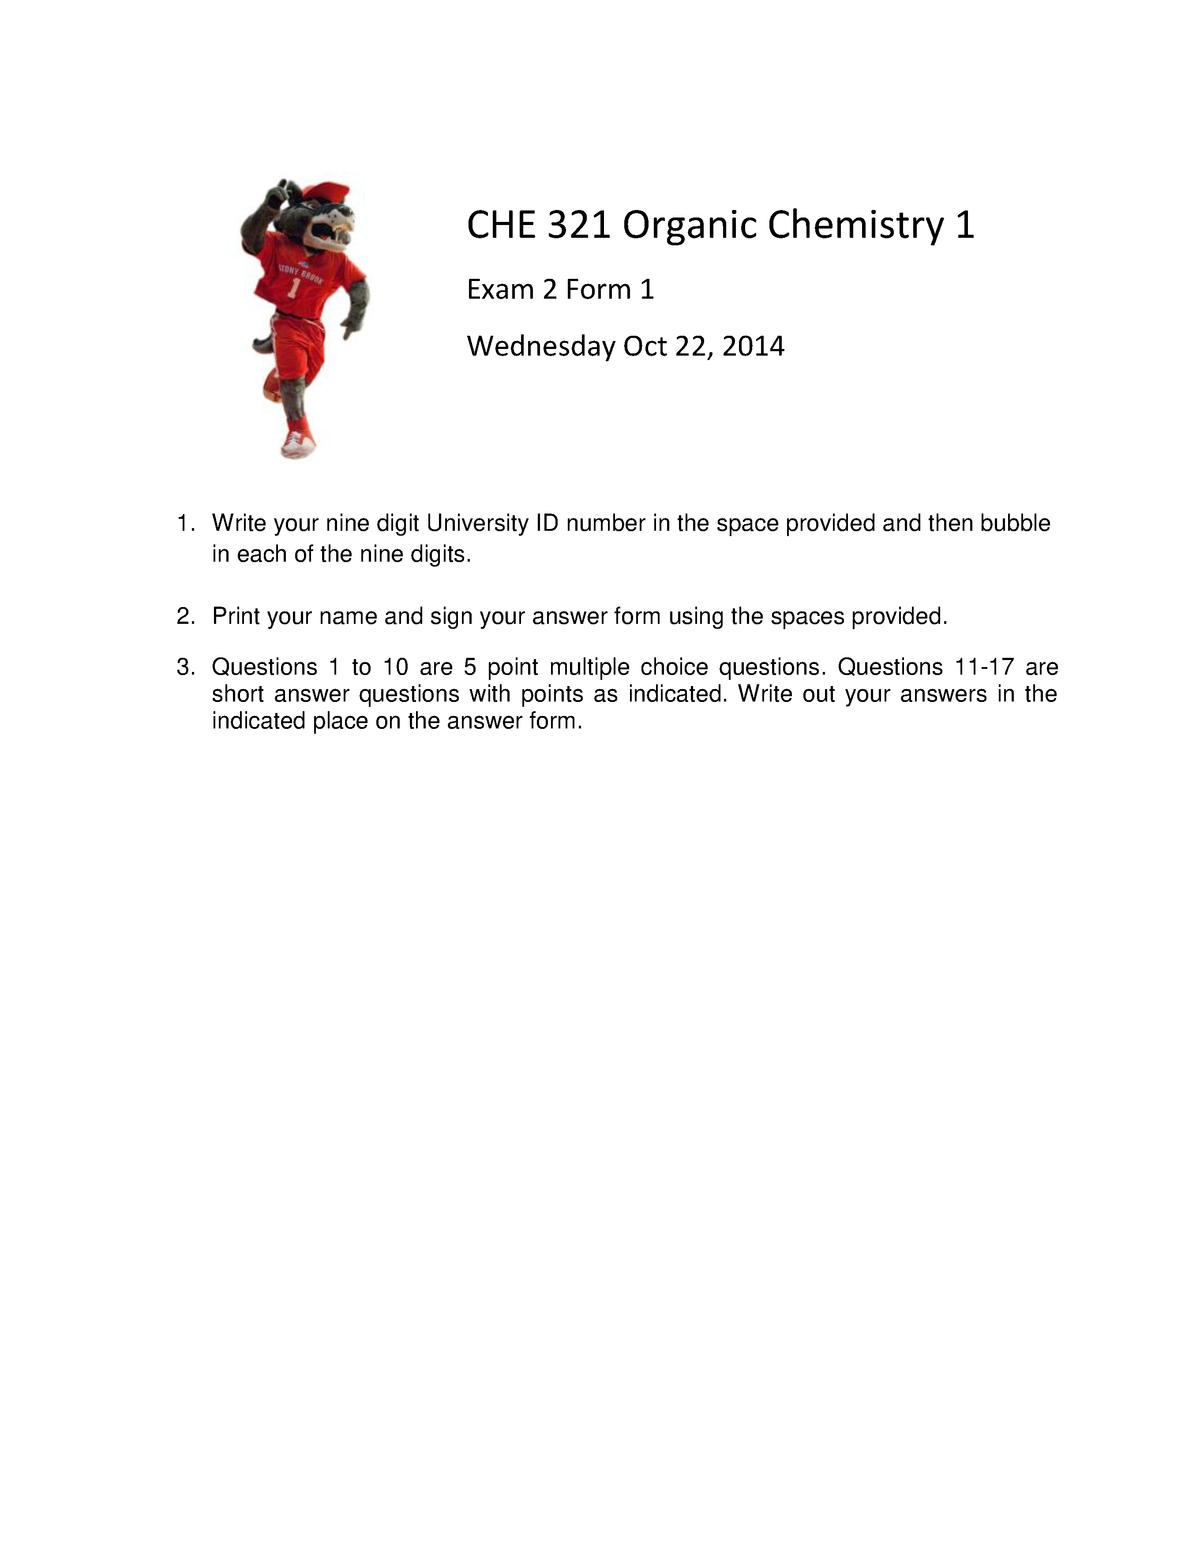 Exam 2014 - CHE 321: Organic Chemistry I - StuDocu